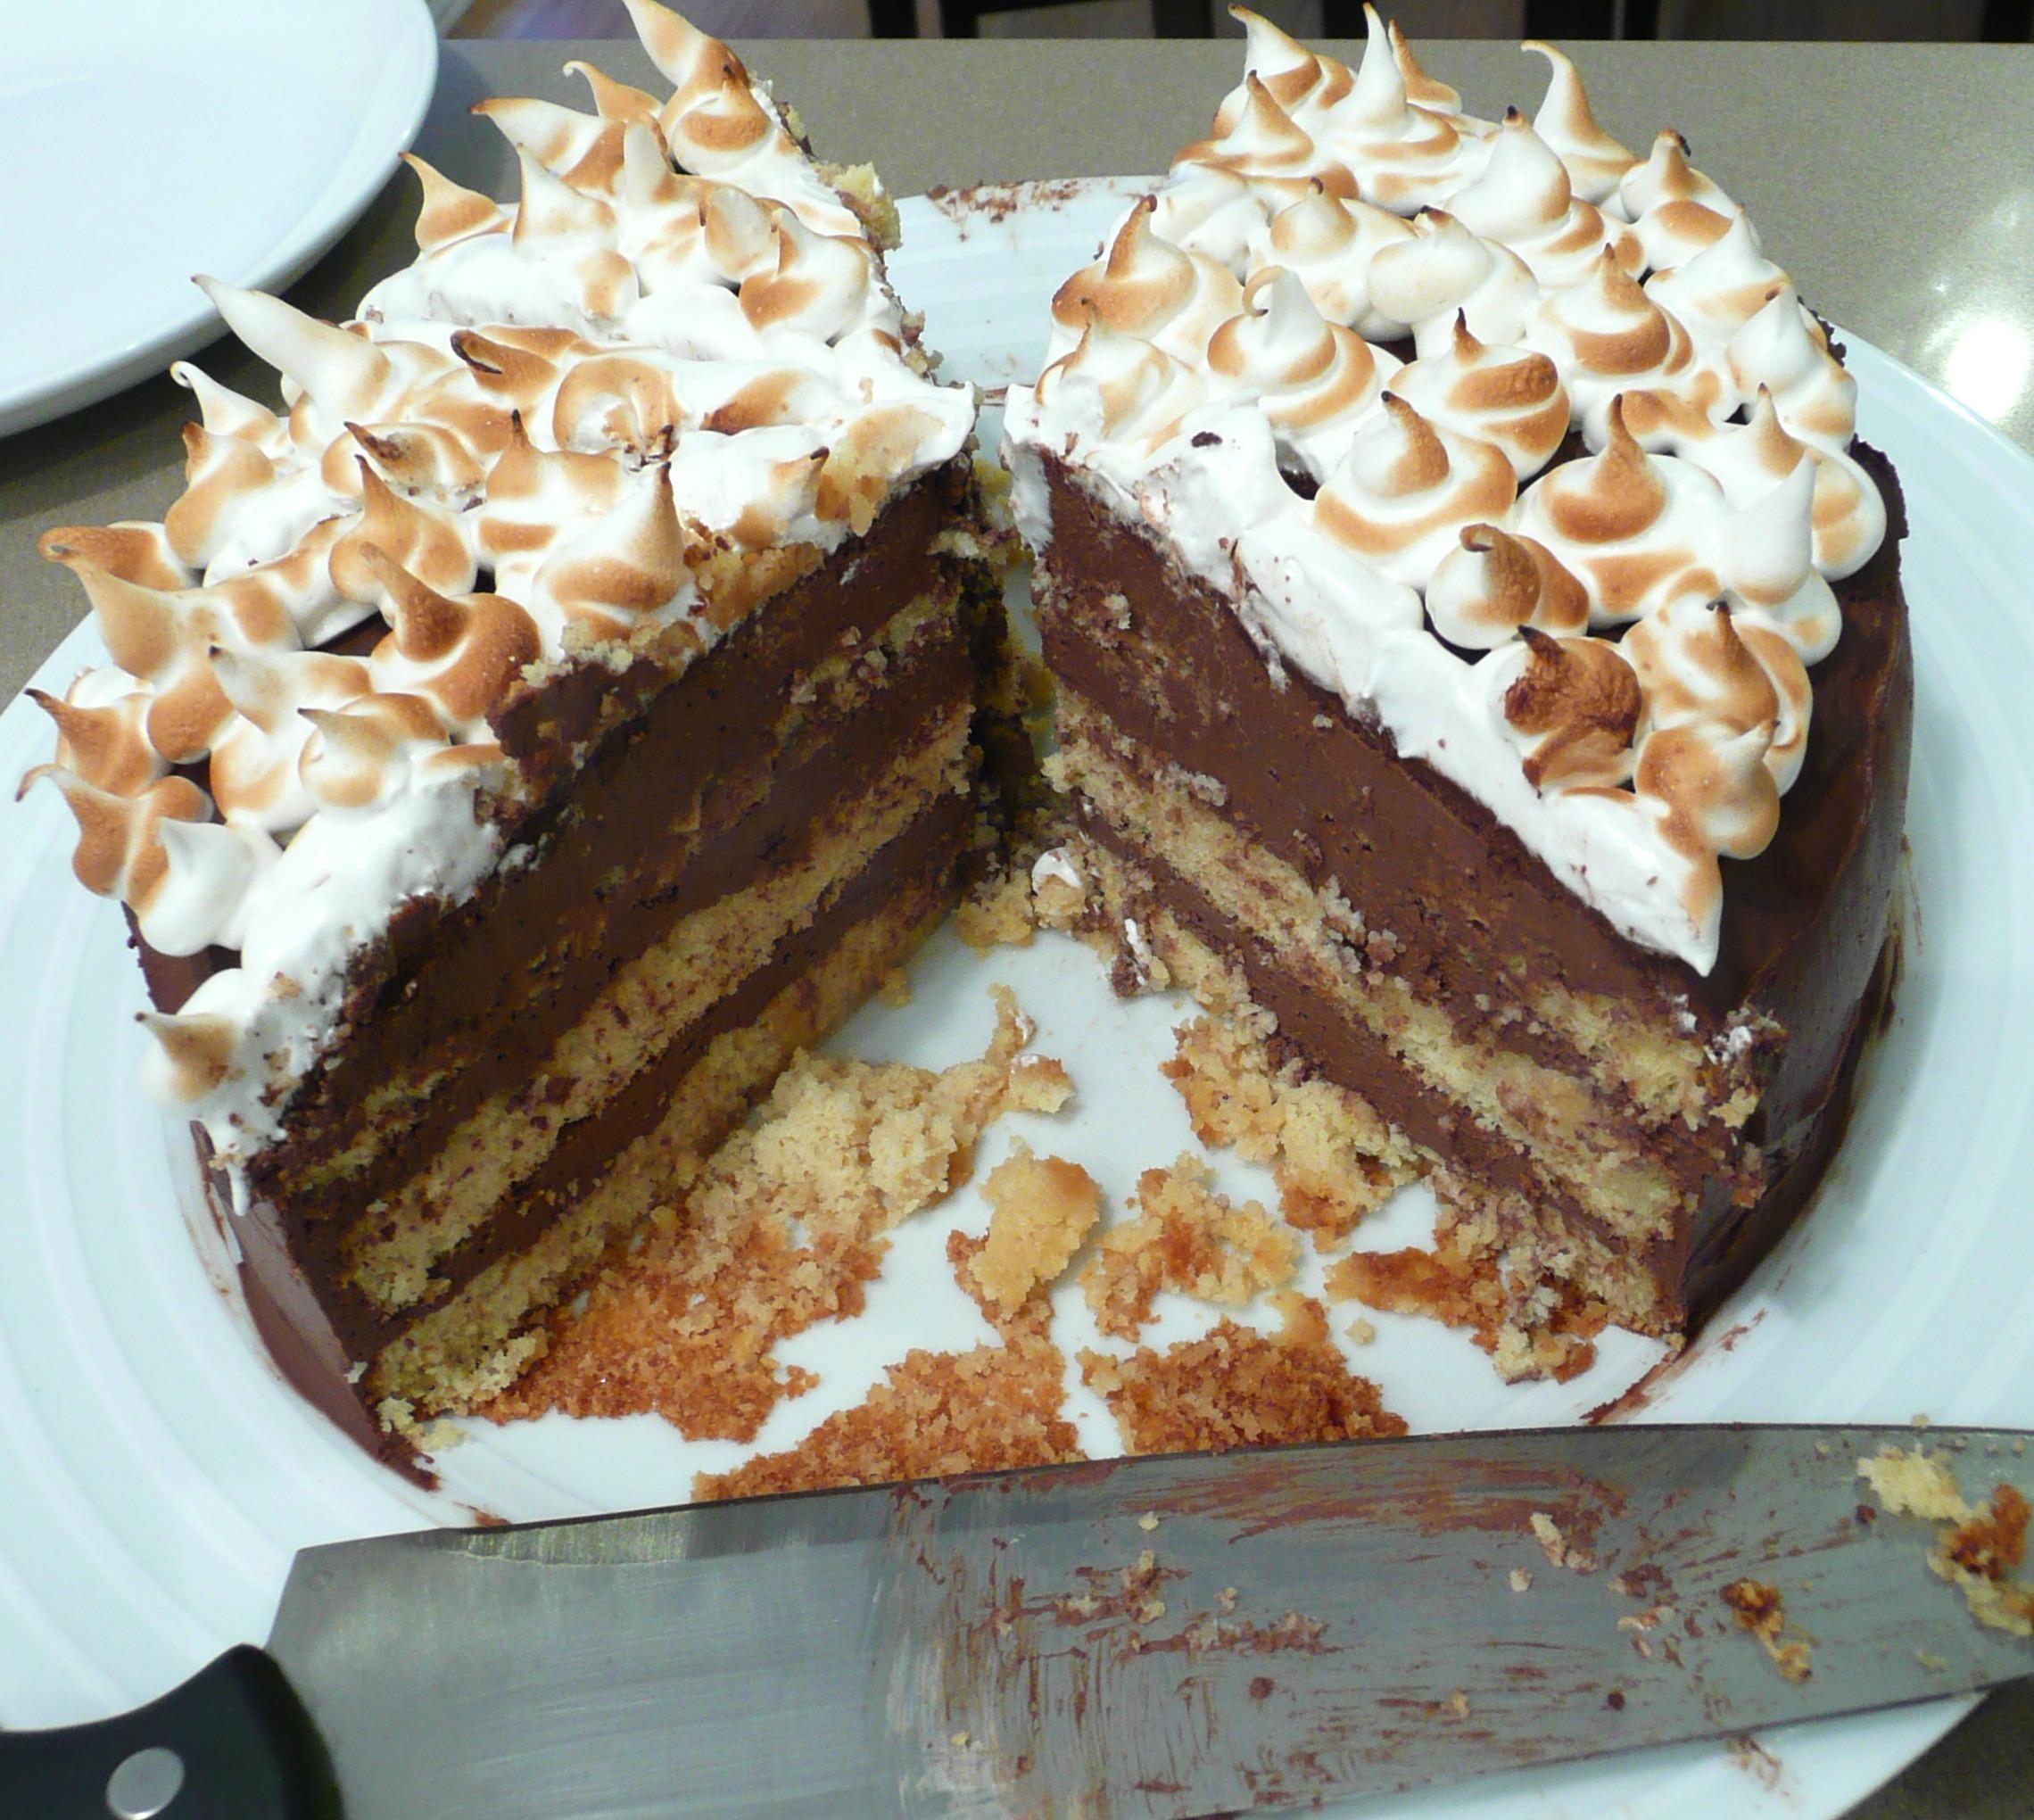 Gâteau étagé (Layer cake) chocolat-amande (IG bas, sans lactose, sans gluten)